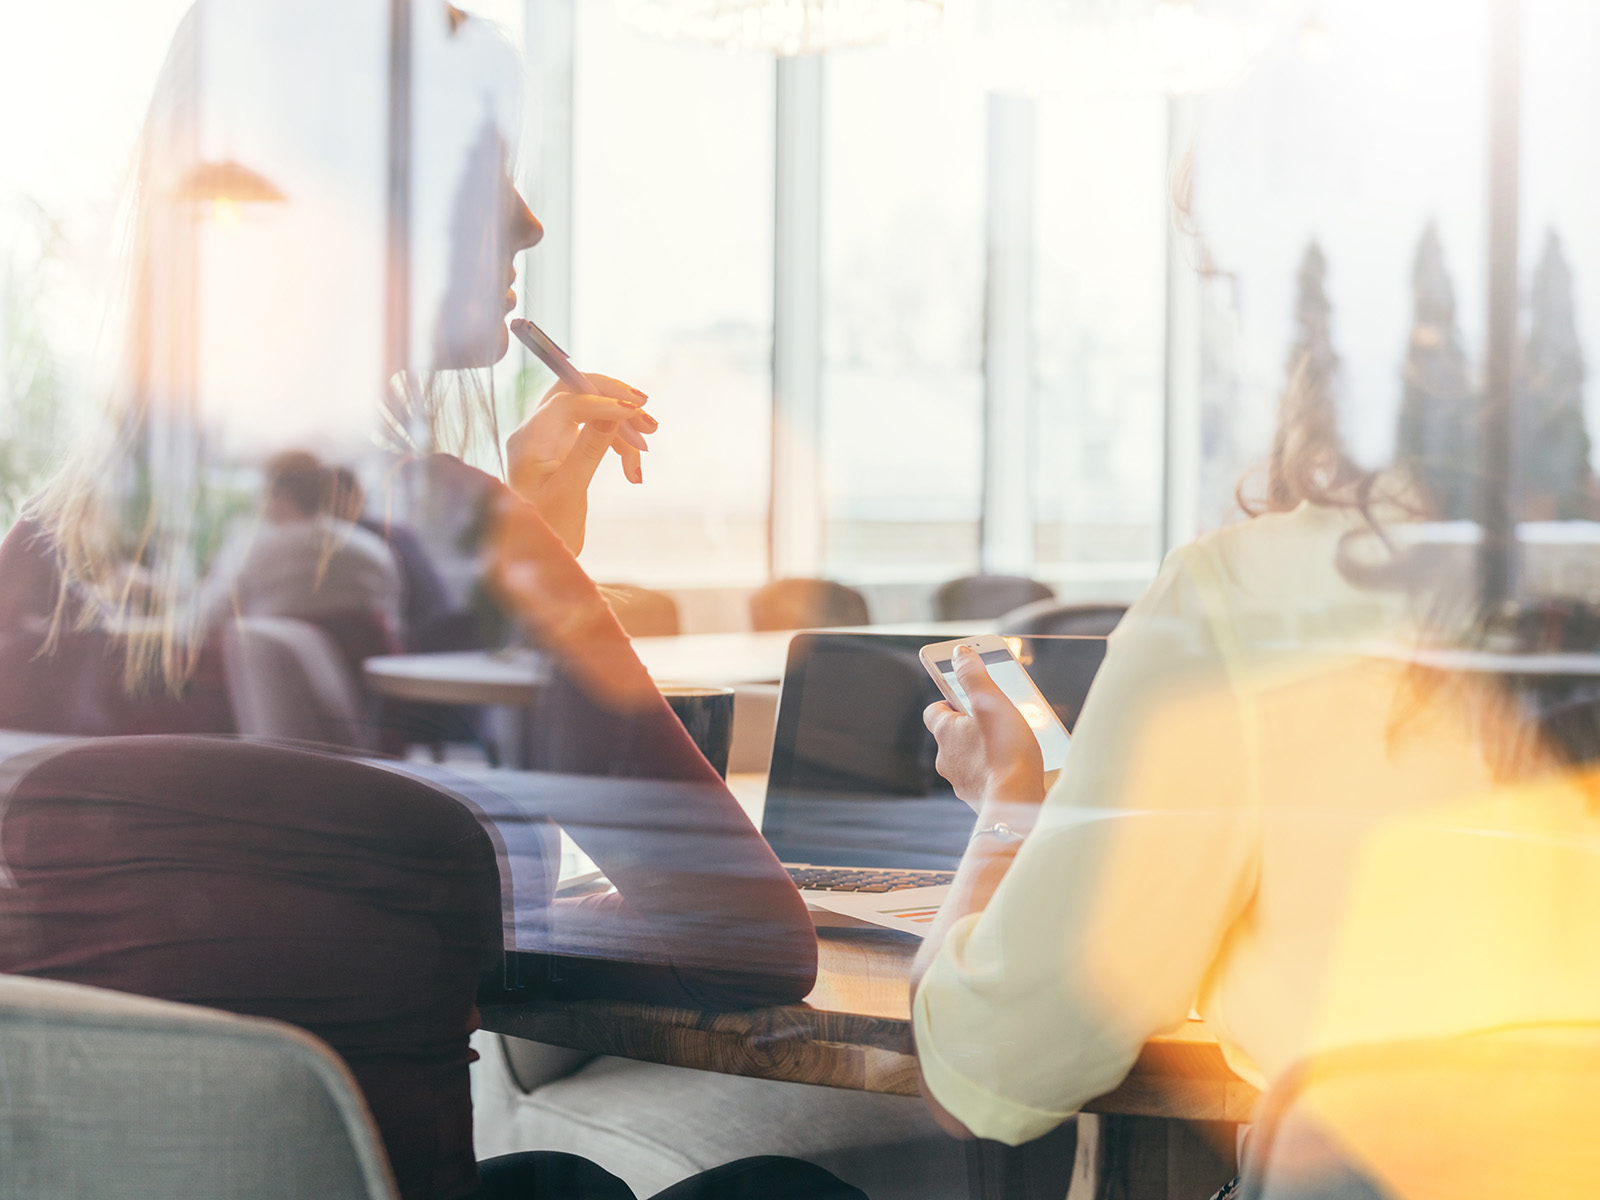 Zwei Frauen besprechen im Office Digital Branding Themen